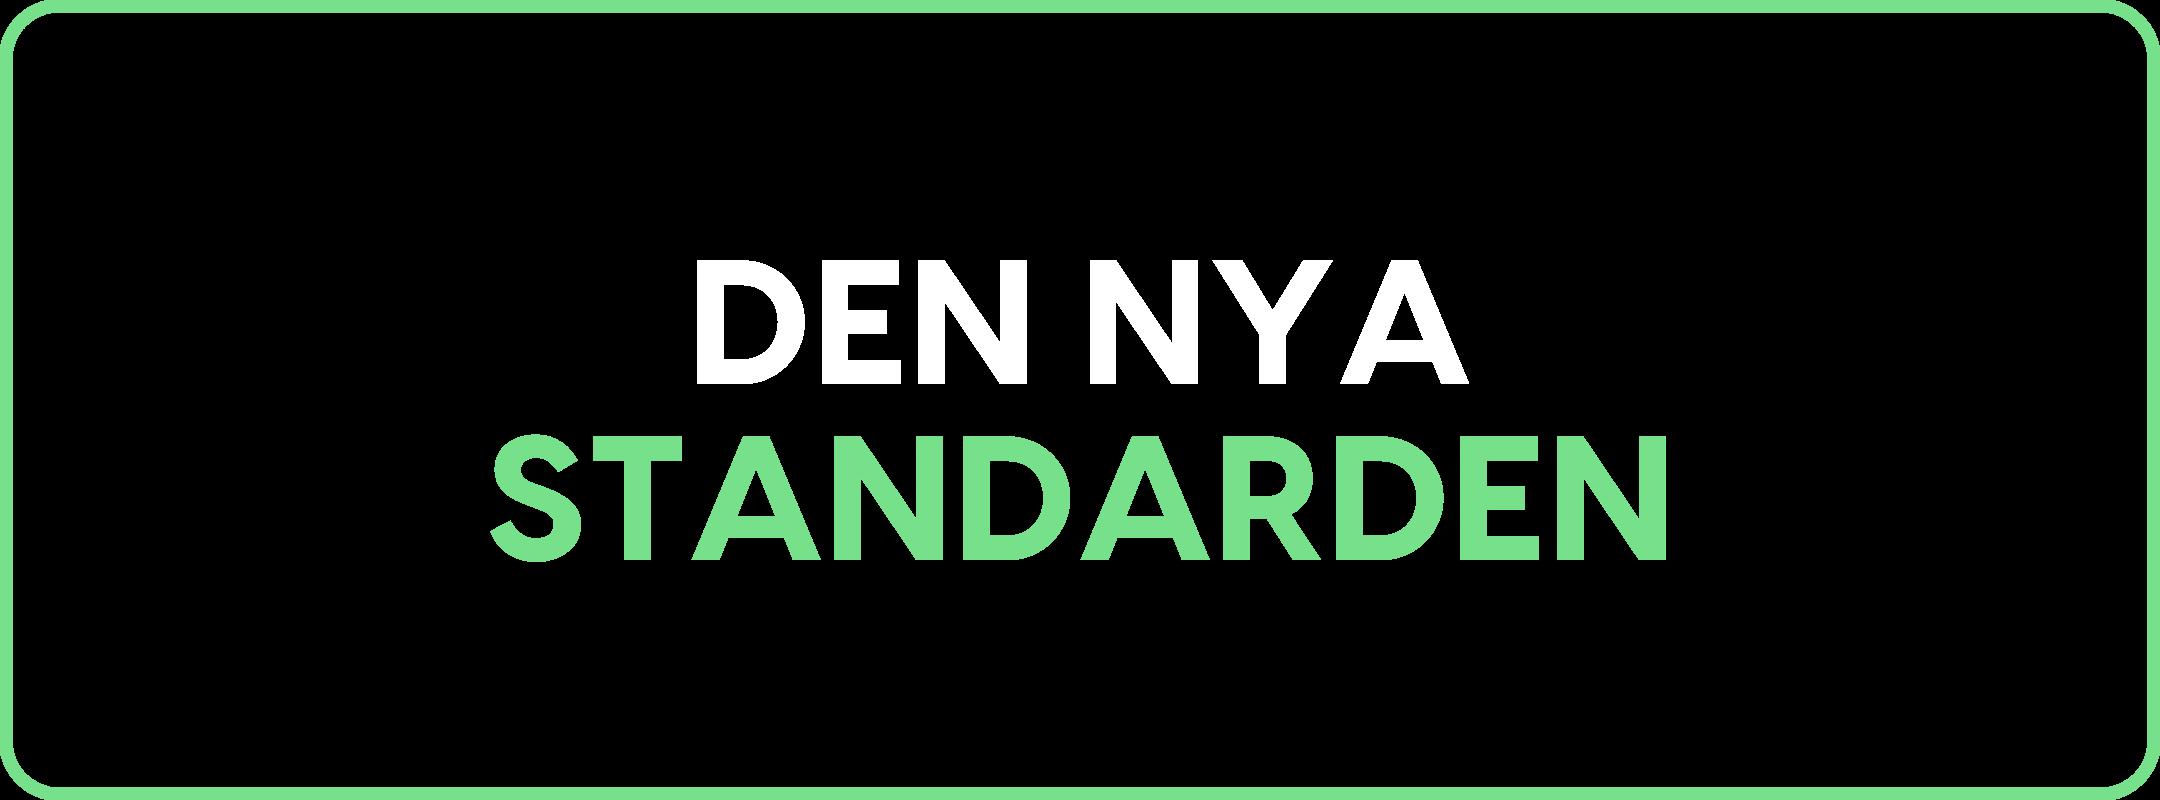 Den nya standarden